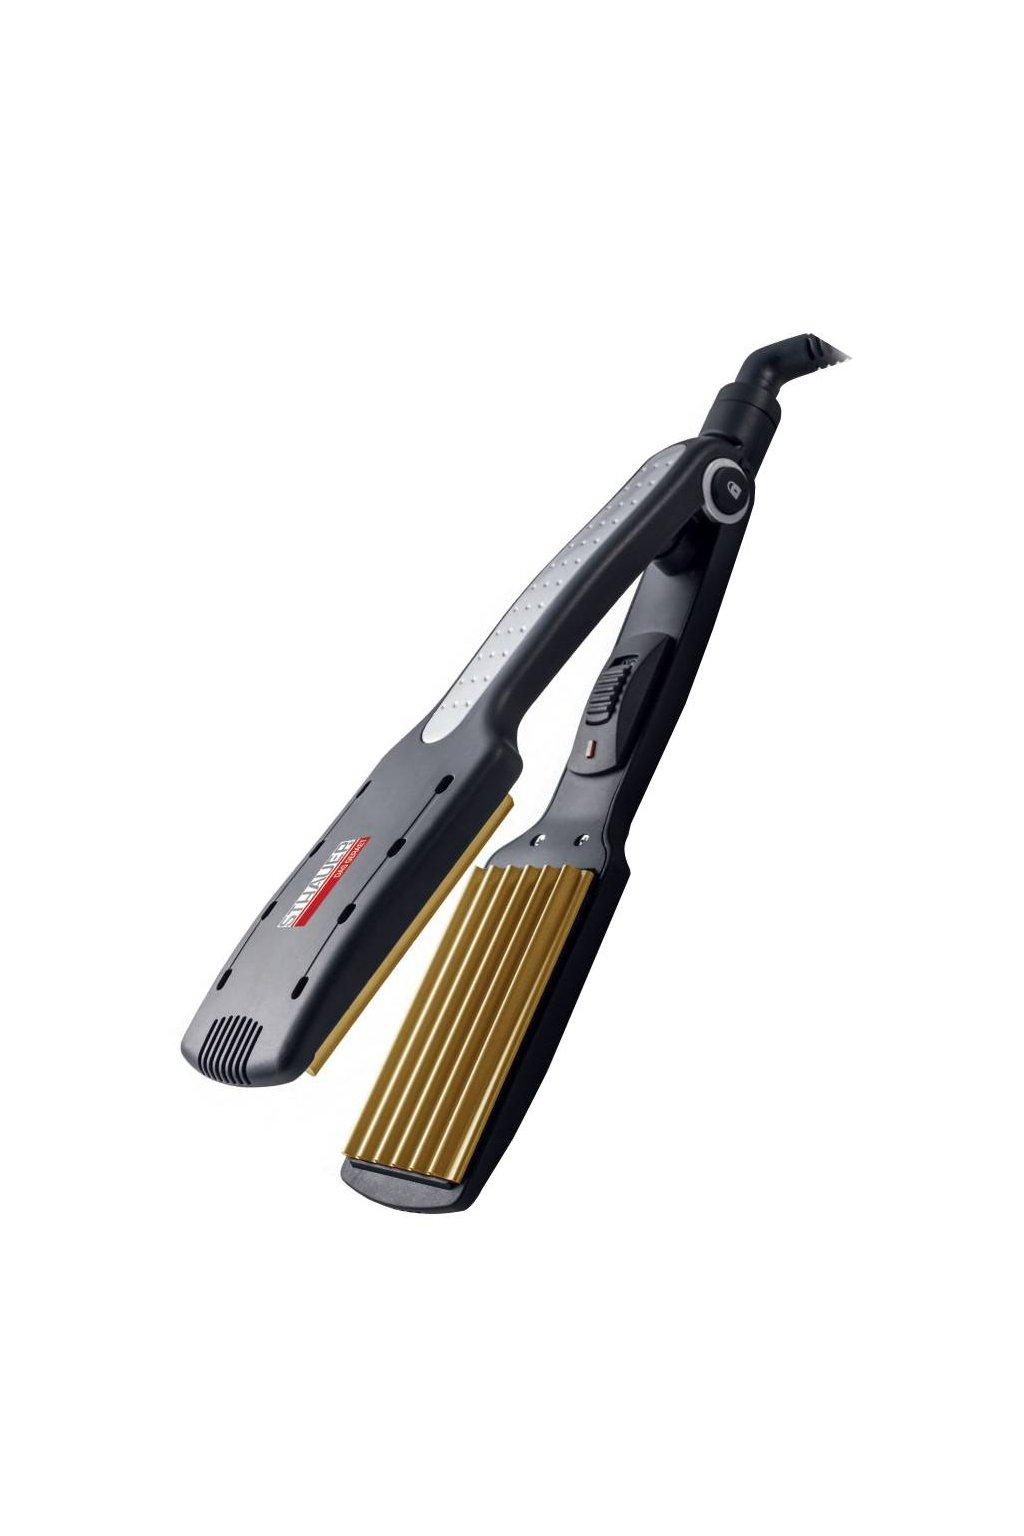 9434 krepovacka na vlasy sthauer java keramicka turmalinova technologie sirka 5cm